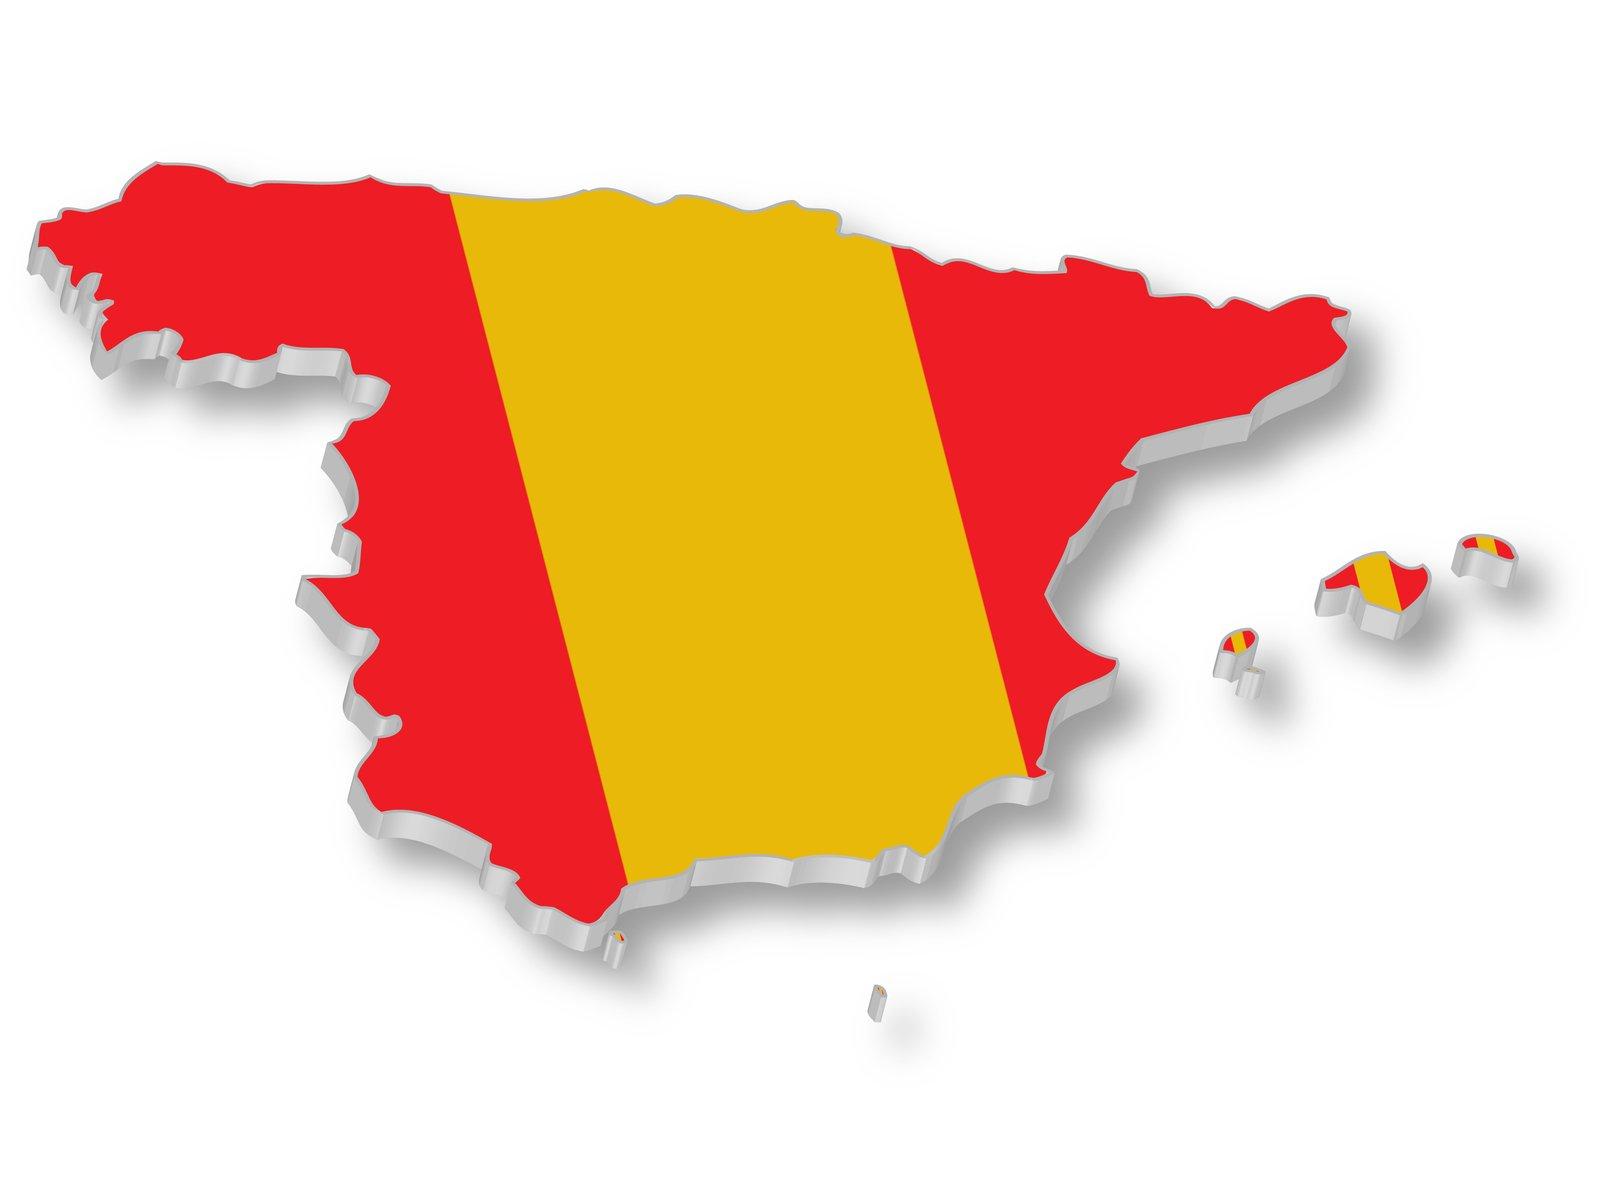 Spanische Karte.Free Spanien Karte 1 Stock Photo Freeimages Com